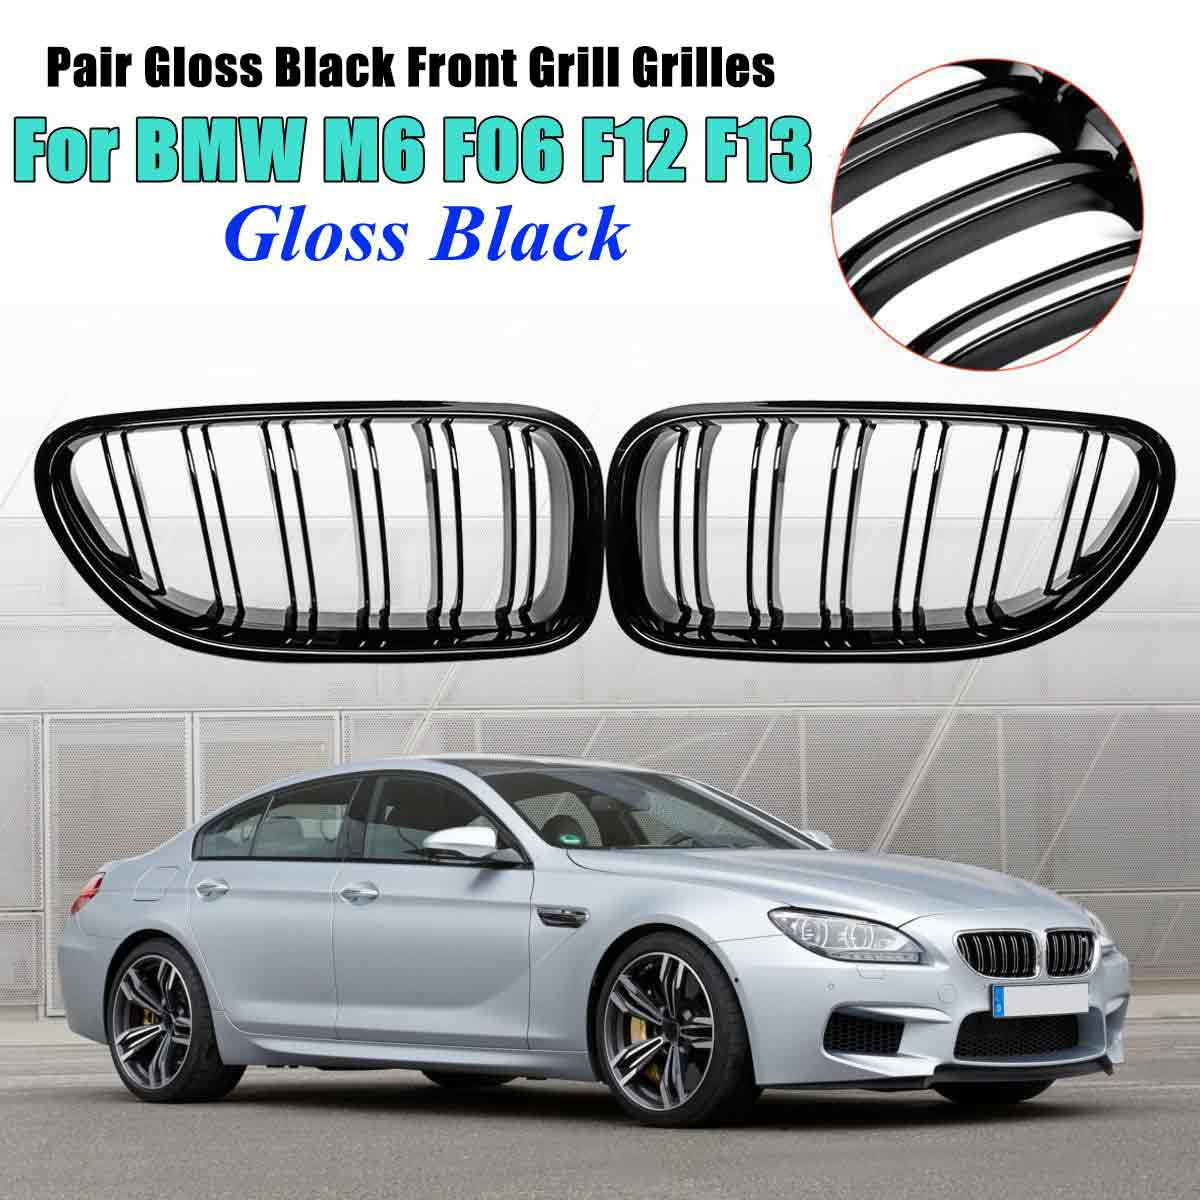 For BMW M6 640i 650i F06 F12 F13 2012 2013 2014 2015 2016 2017 Car Front Kidney Grill Bumper Grill Double Slat Line Gloss Black